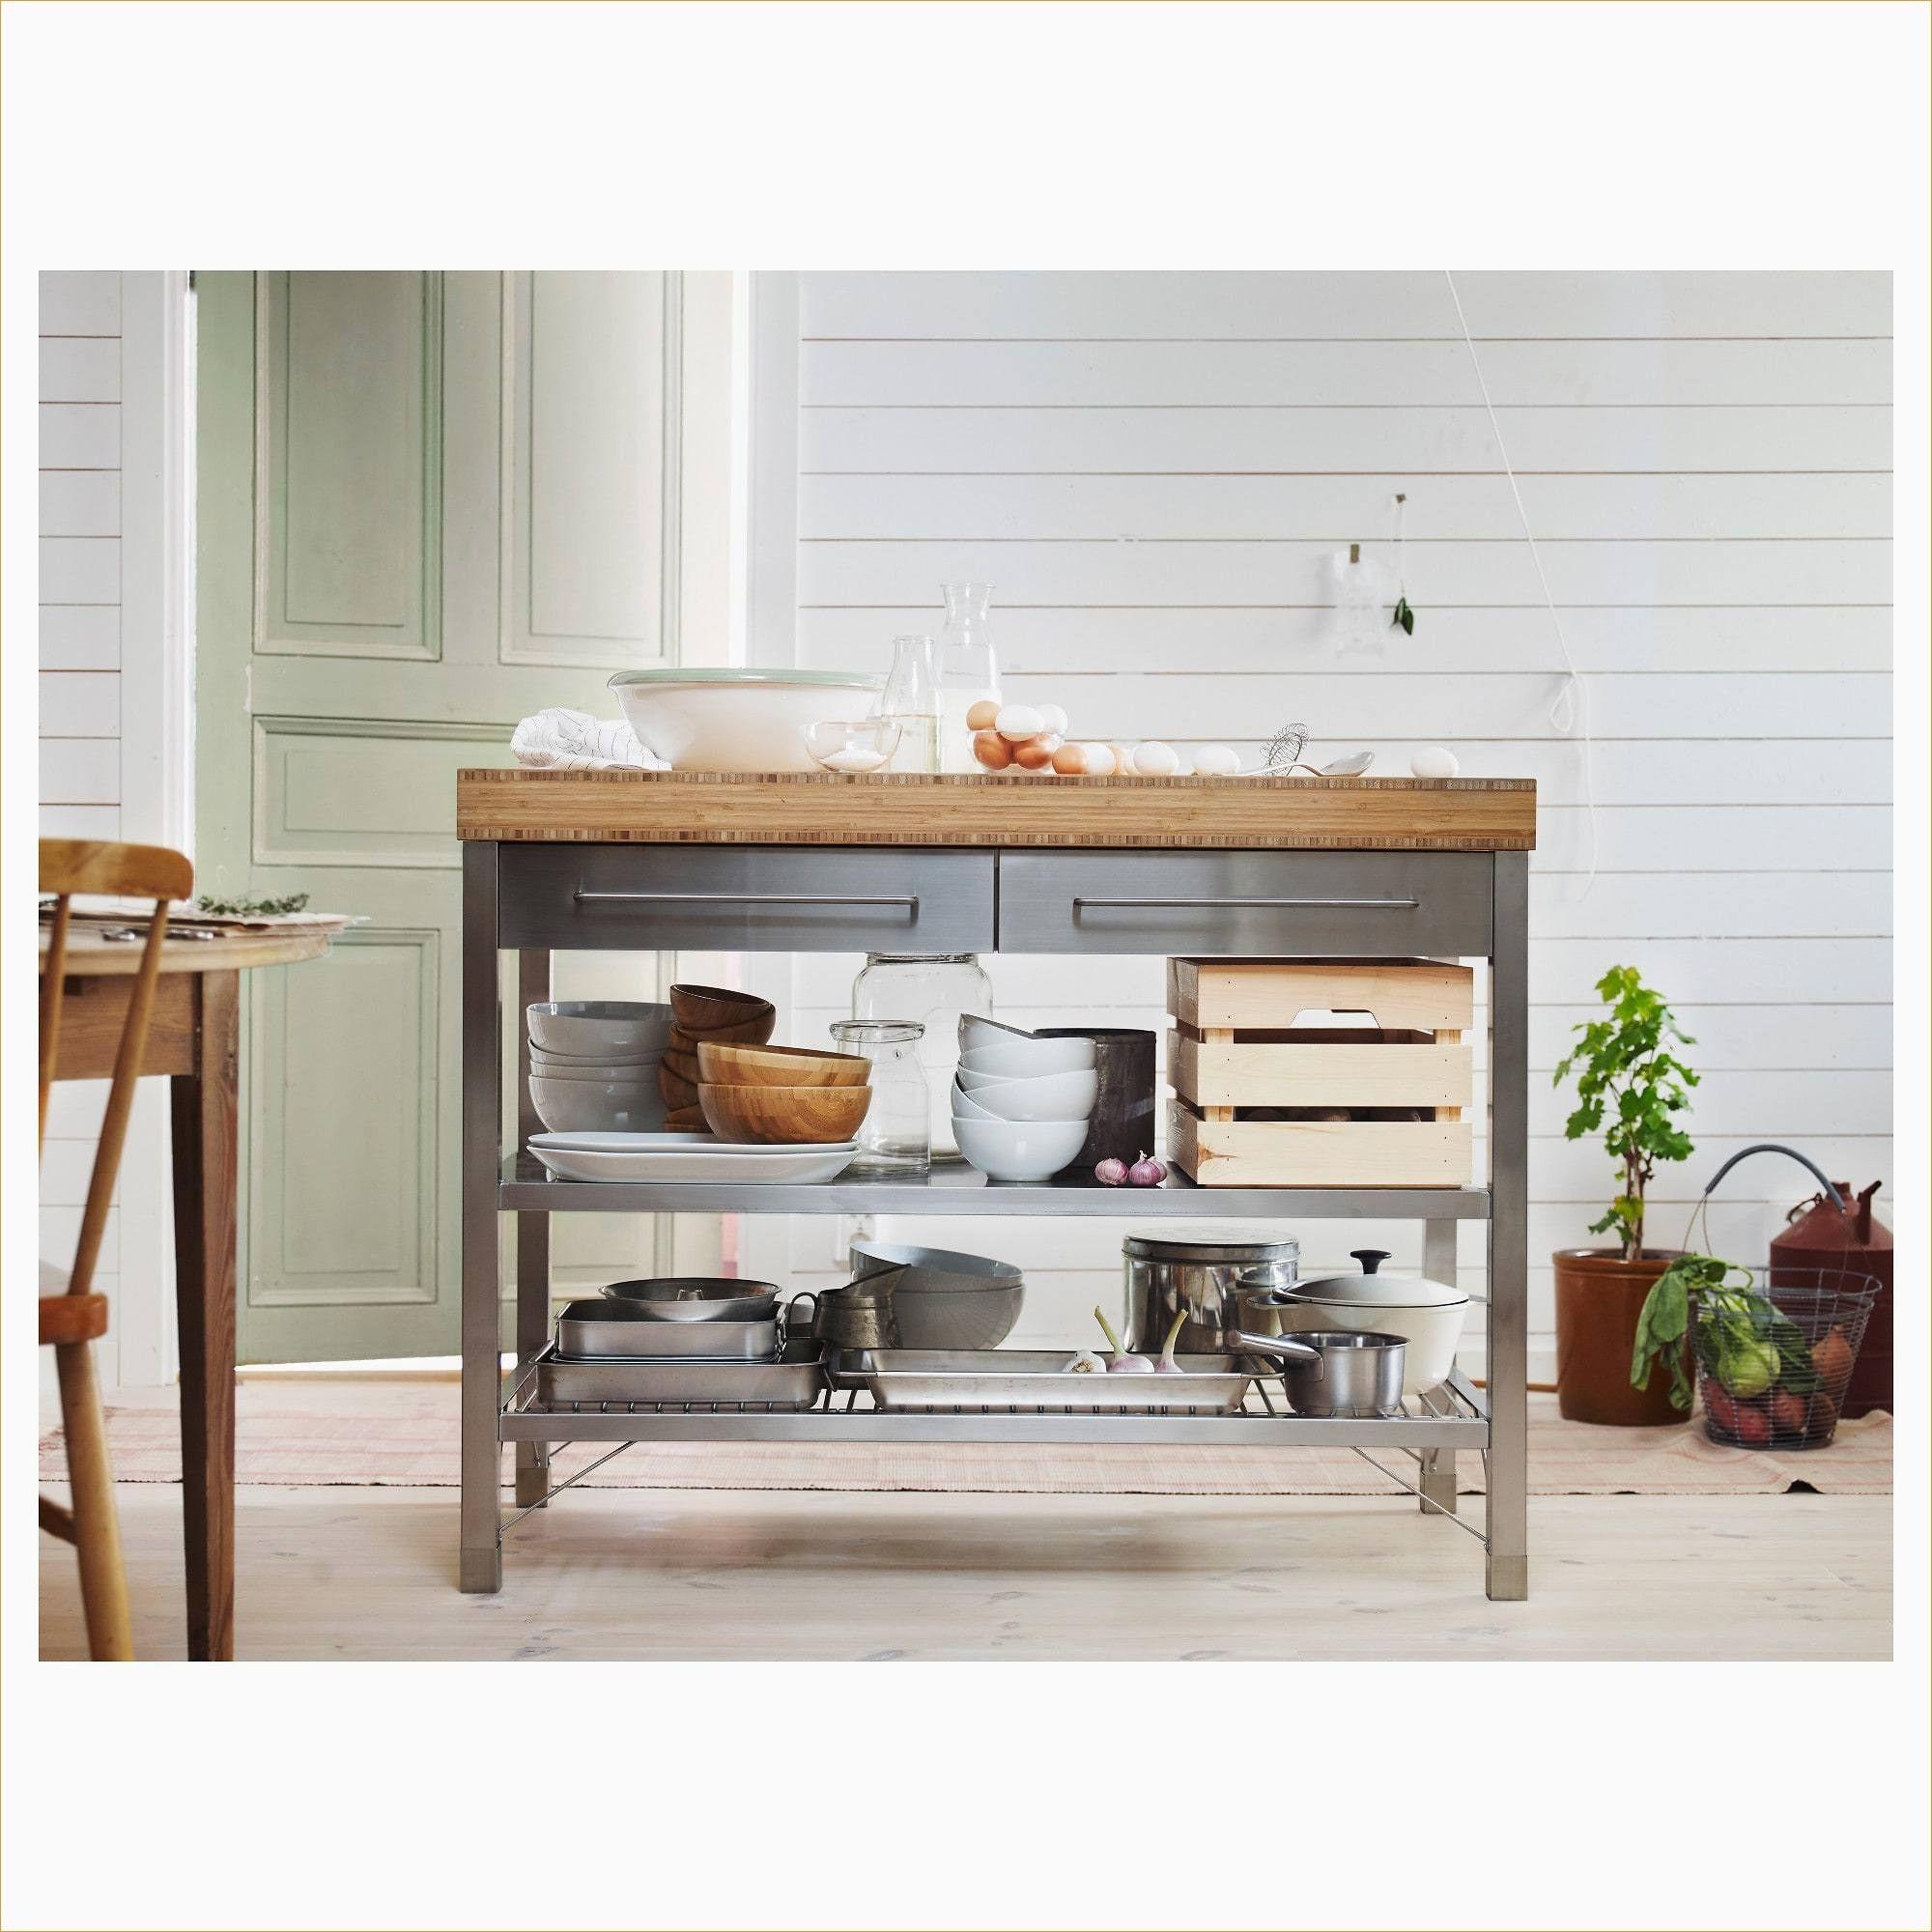 Full Size of Komplettküche Billig Komplettküche Angebot Komplettküche Kaufen Komplettküche Mit Geräten Küche Komplettküche